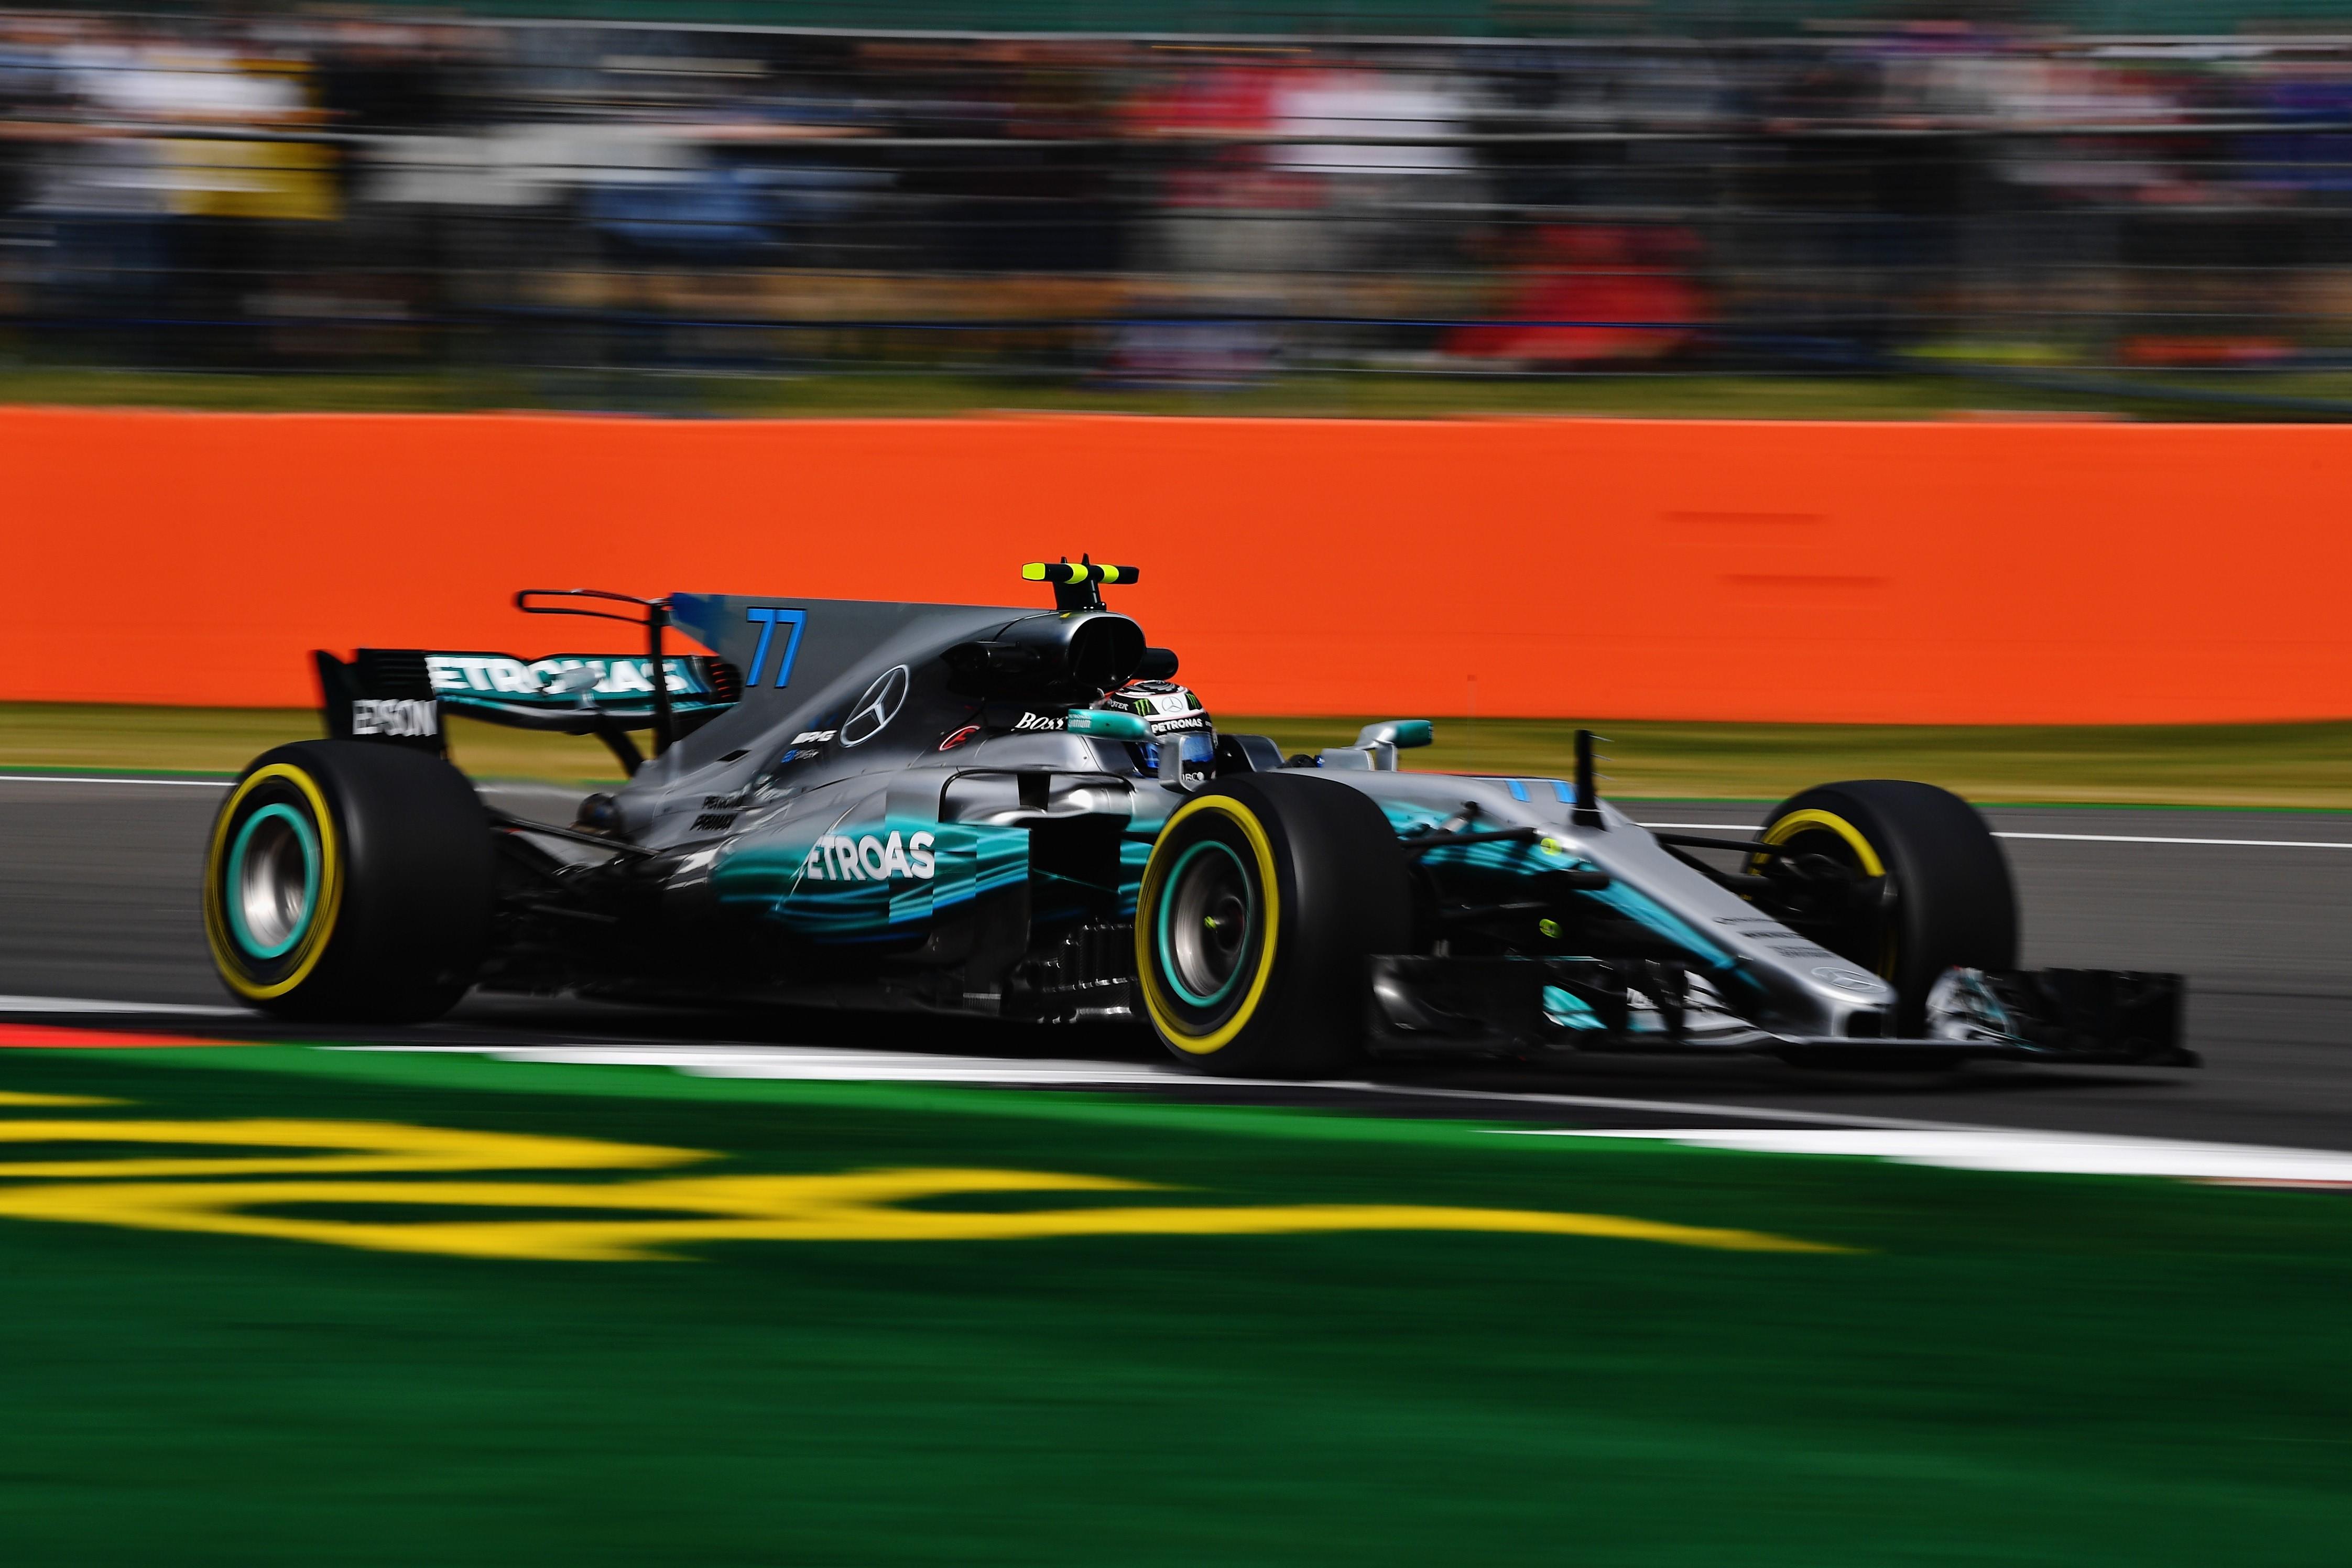 Valtteri Bottas (Mercedes) au Grand Prix de Grande-Bretagne 2017